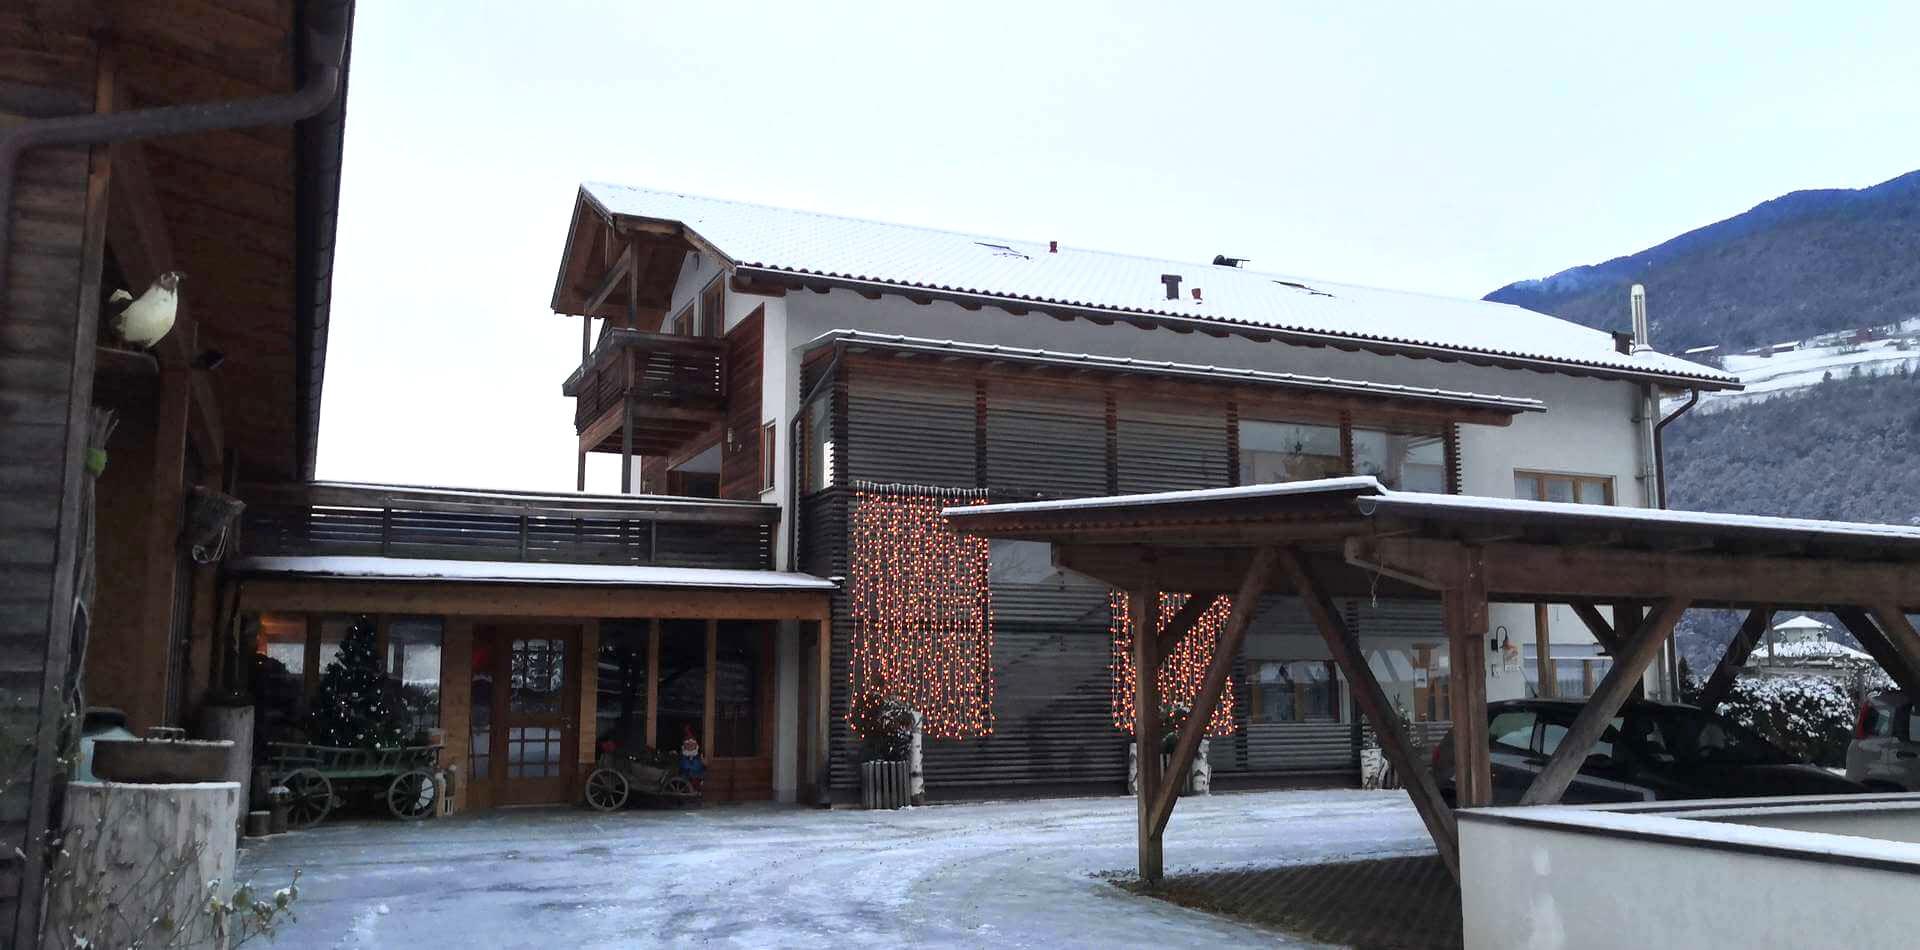 skiurlaub-brixen-suedtirol-6